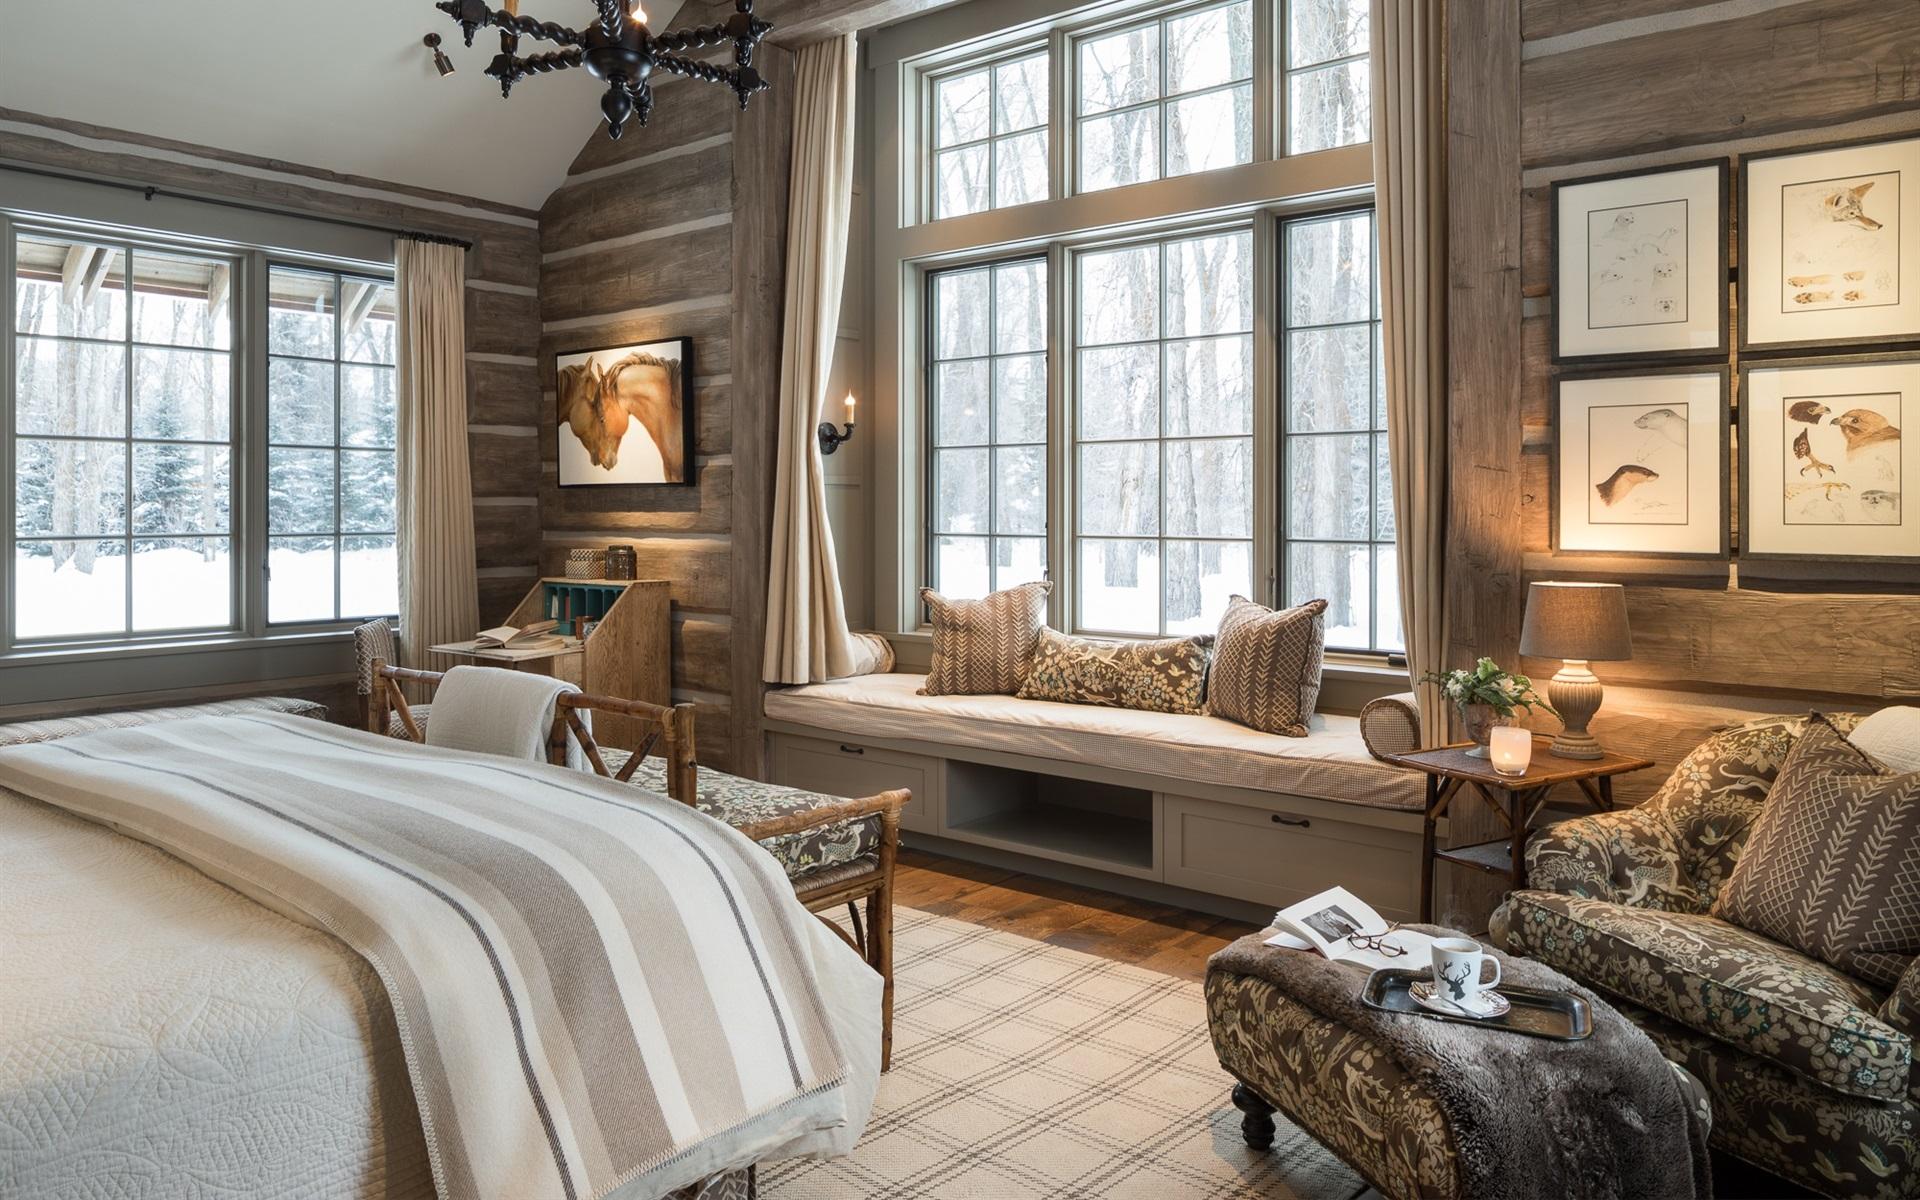 Schlafzimmer Fenster Bett Stuhle Kerzen 1920x1200 Hd Hintergrundbilder Hd Bild